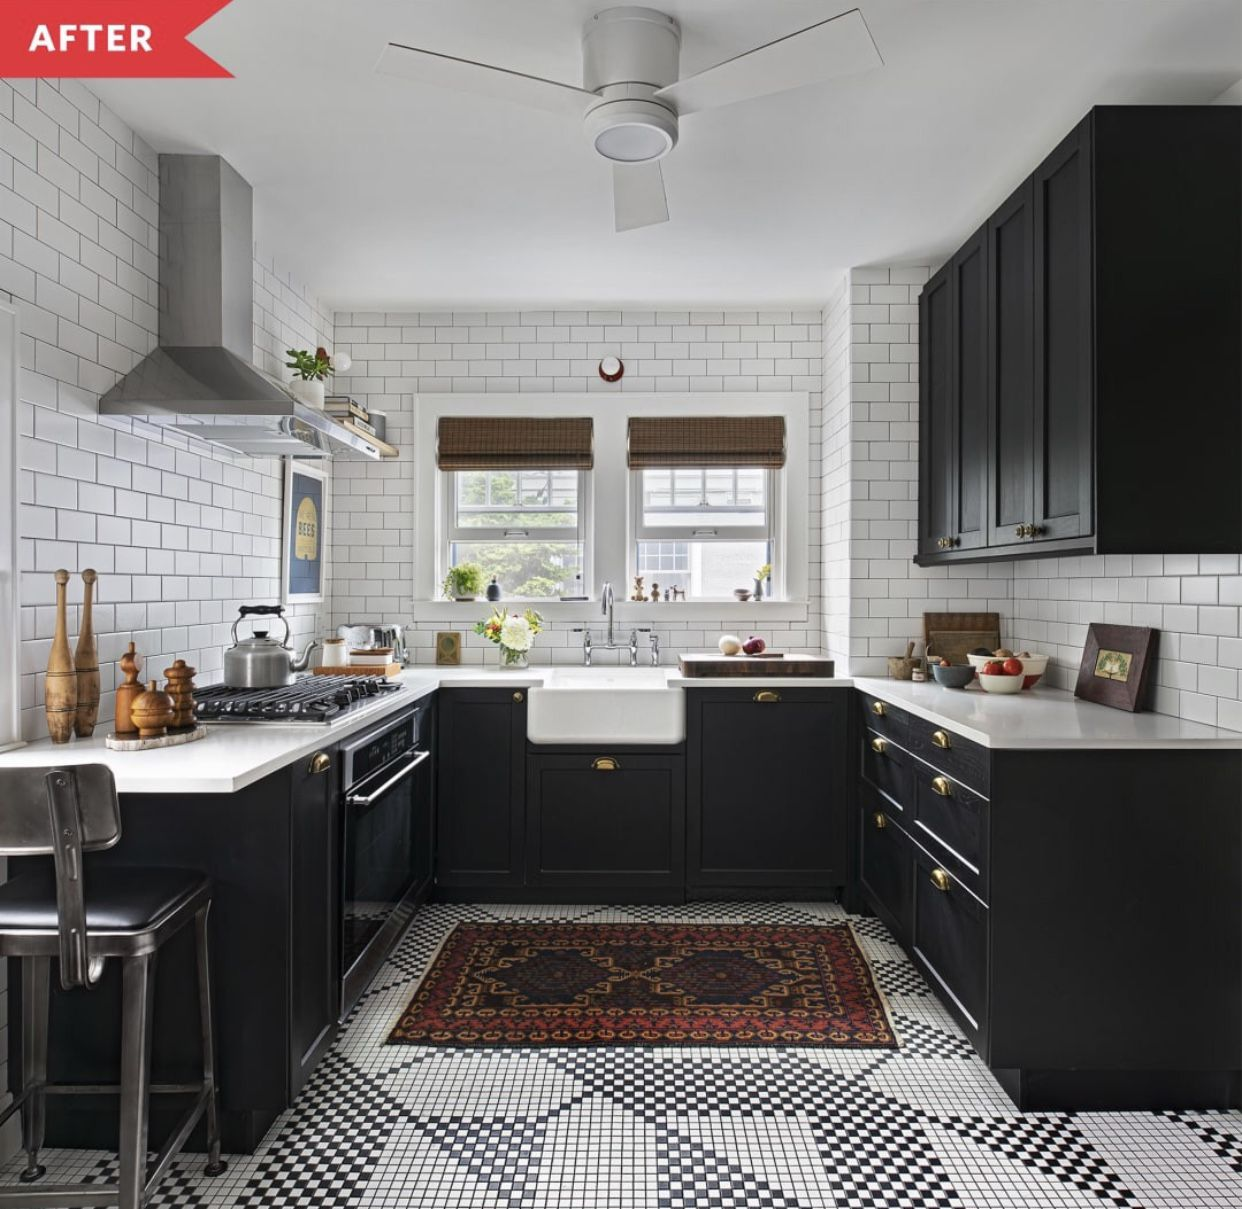 Designer Patrick Thompson Took The Kitchen In This Craftsman Style Home From Dated Dark And Very Brown To Slee In 2020 Kitchen Remodel Sleek Kitchen Kitchen Flooring